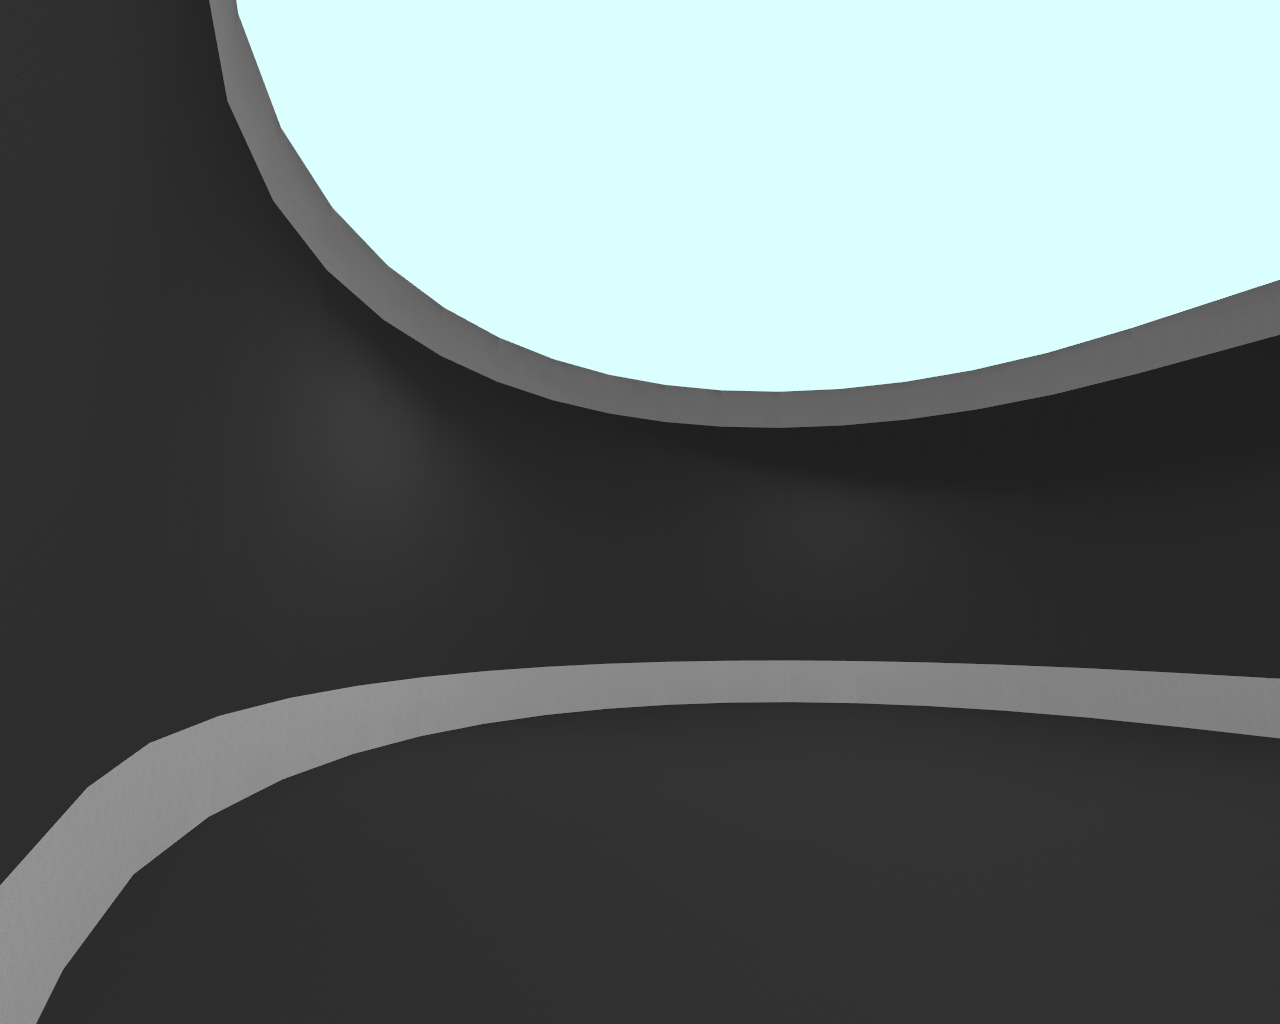 minimalism - Half-Life